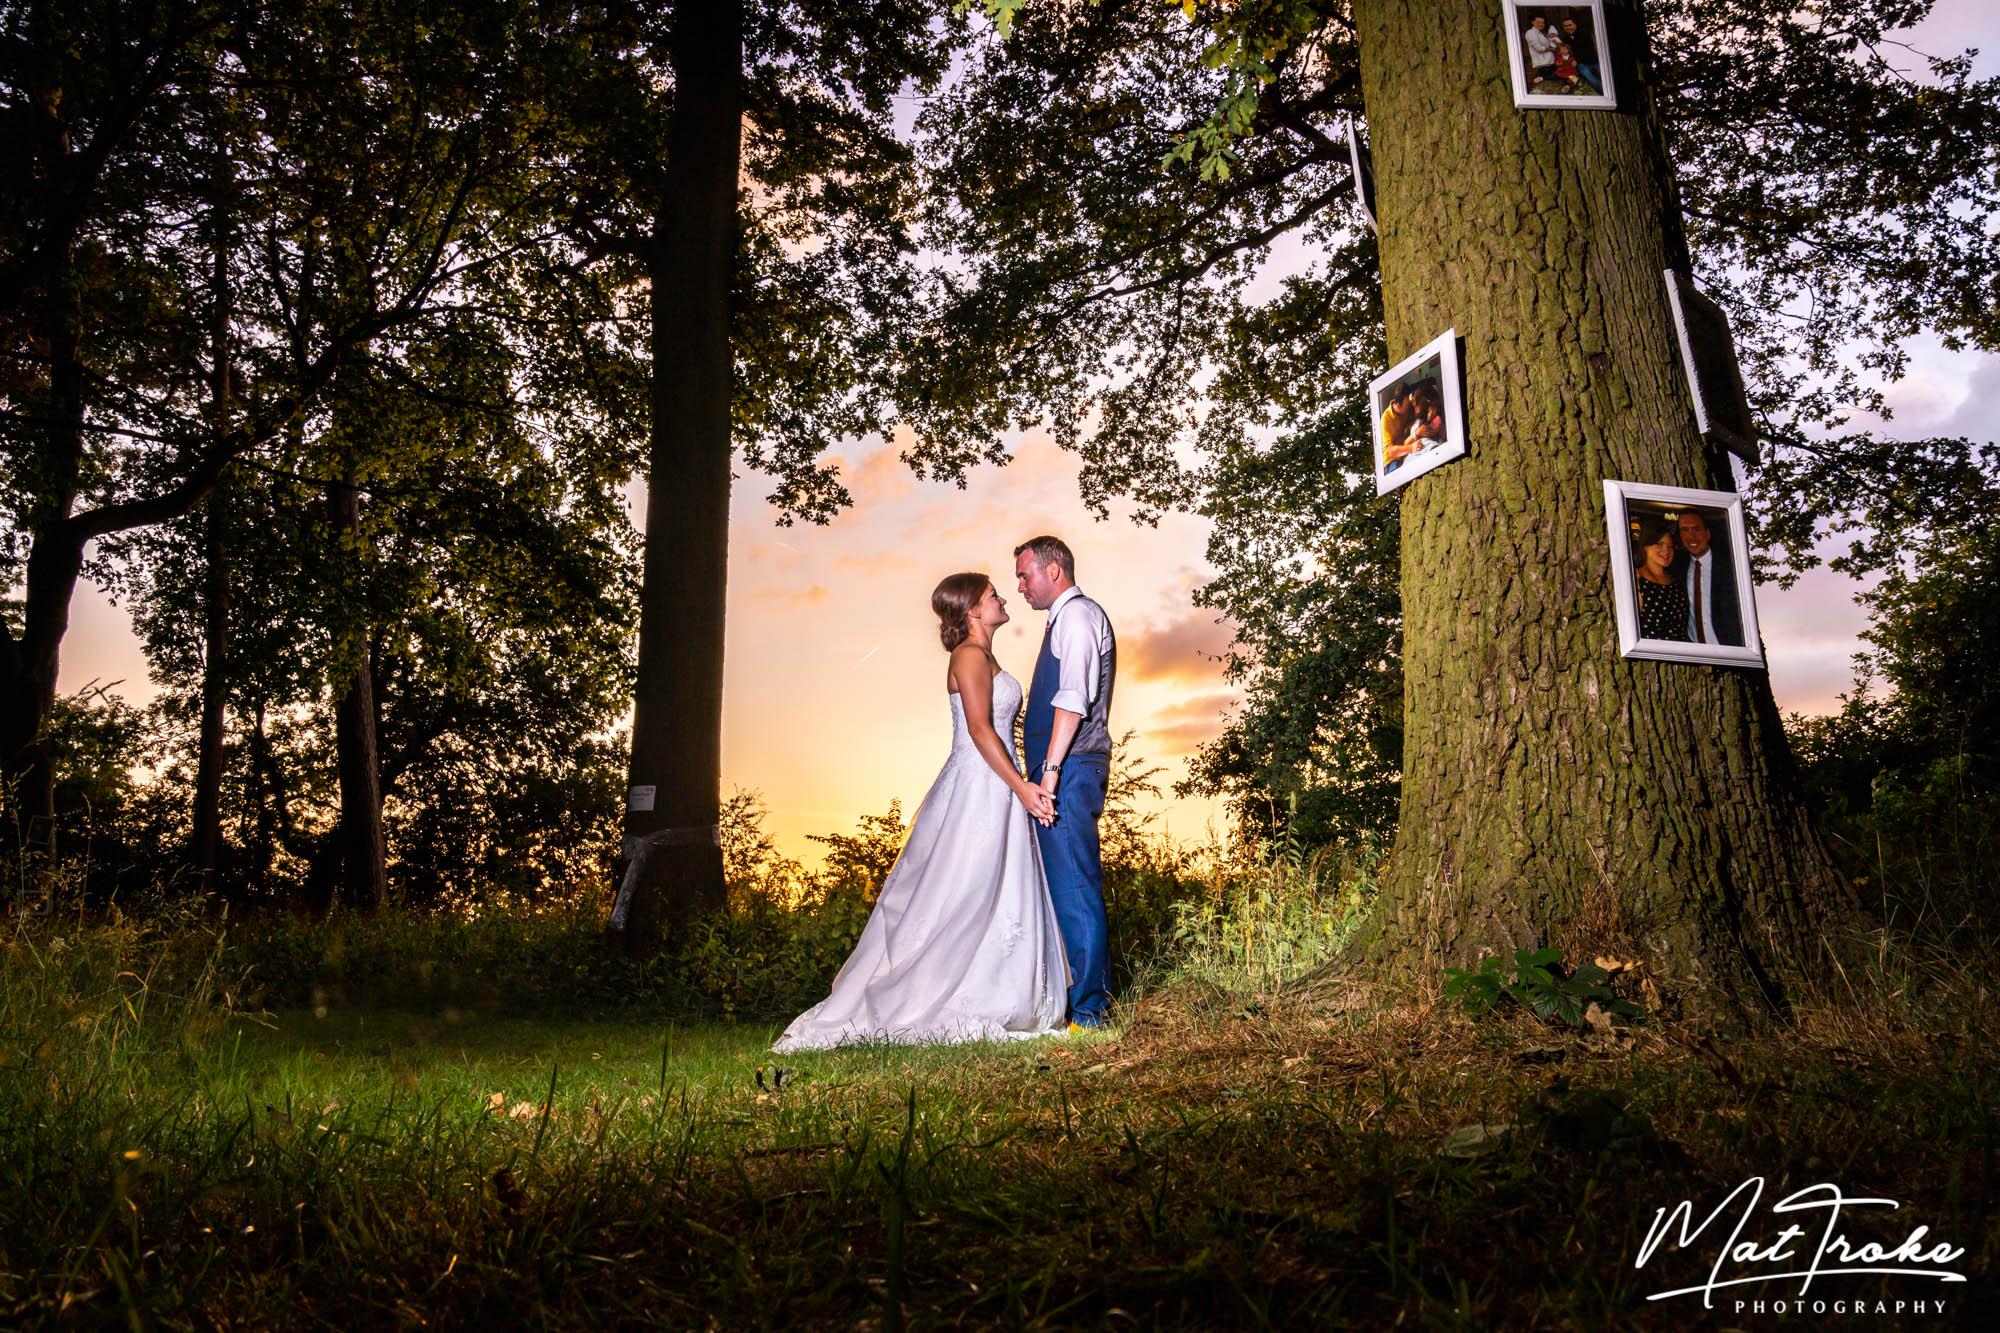 Kelham Country House Wedding - Newark on Trent